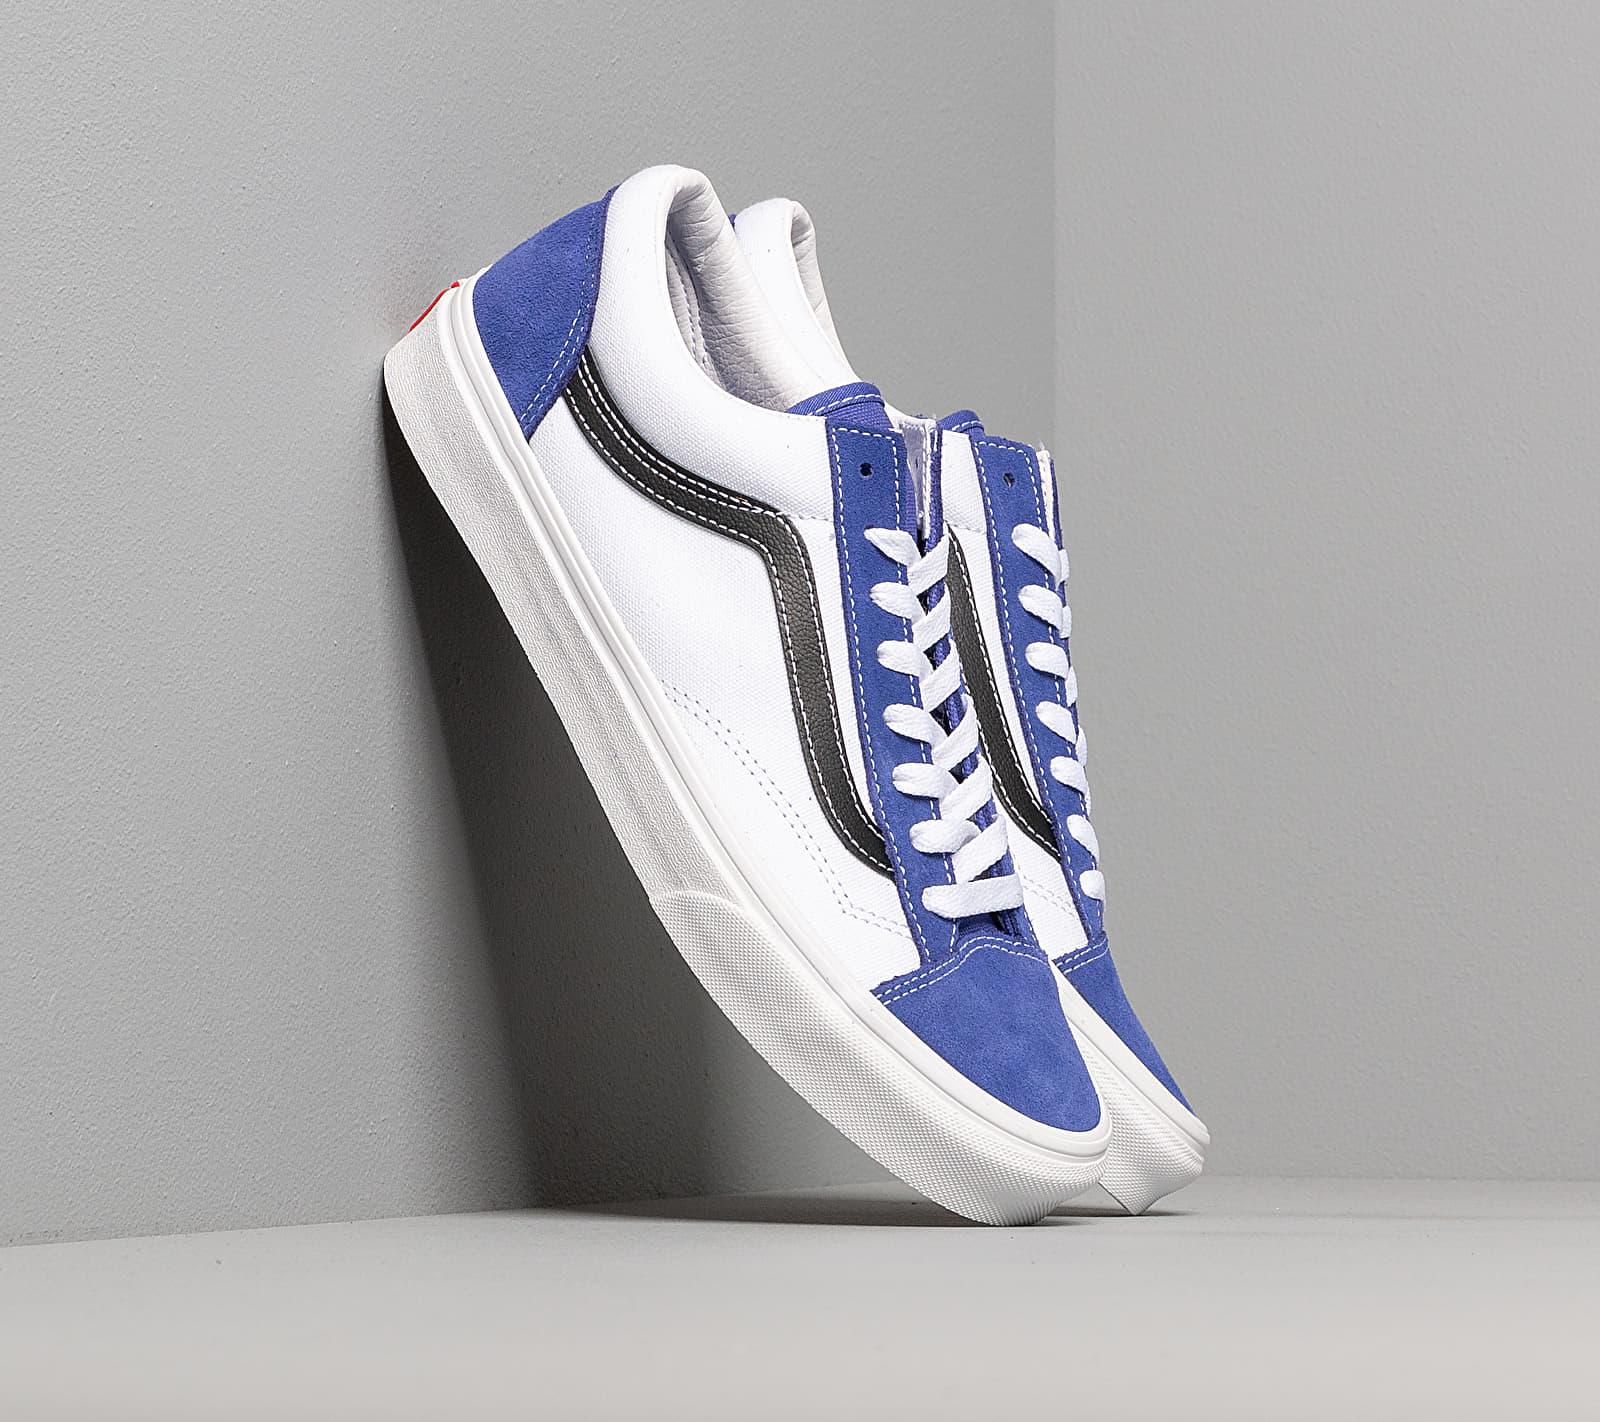 Vans Style 36 (Retro Sport) Royal Blue/ True White, Multicolour